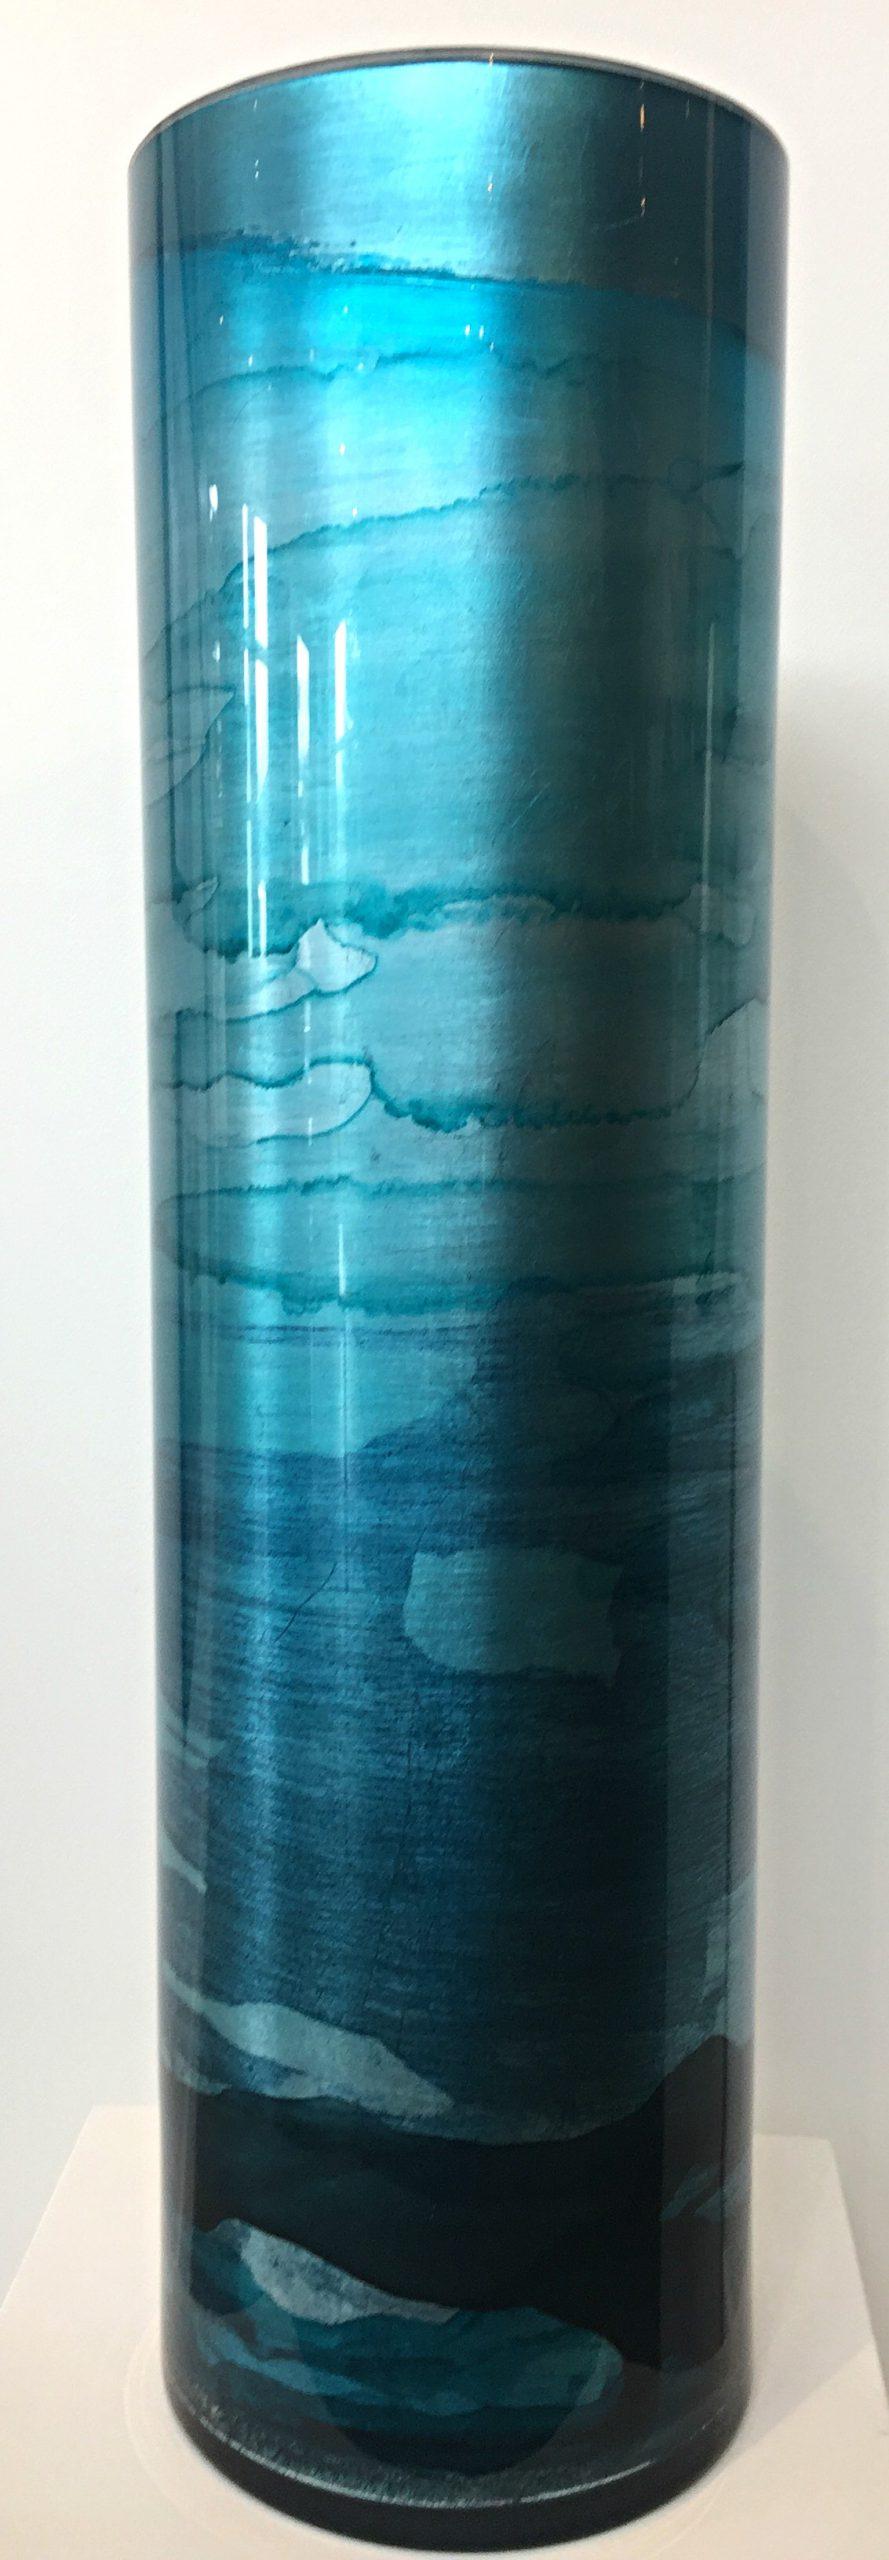 Blue Gilded Vase by David Graff | Effusion Art Gallery + Cast Glass Studio, Invermere BC